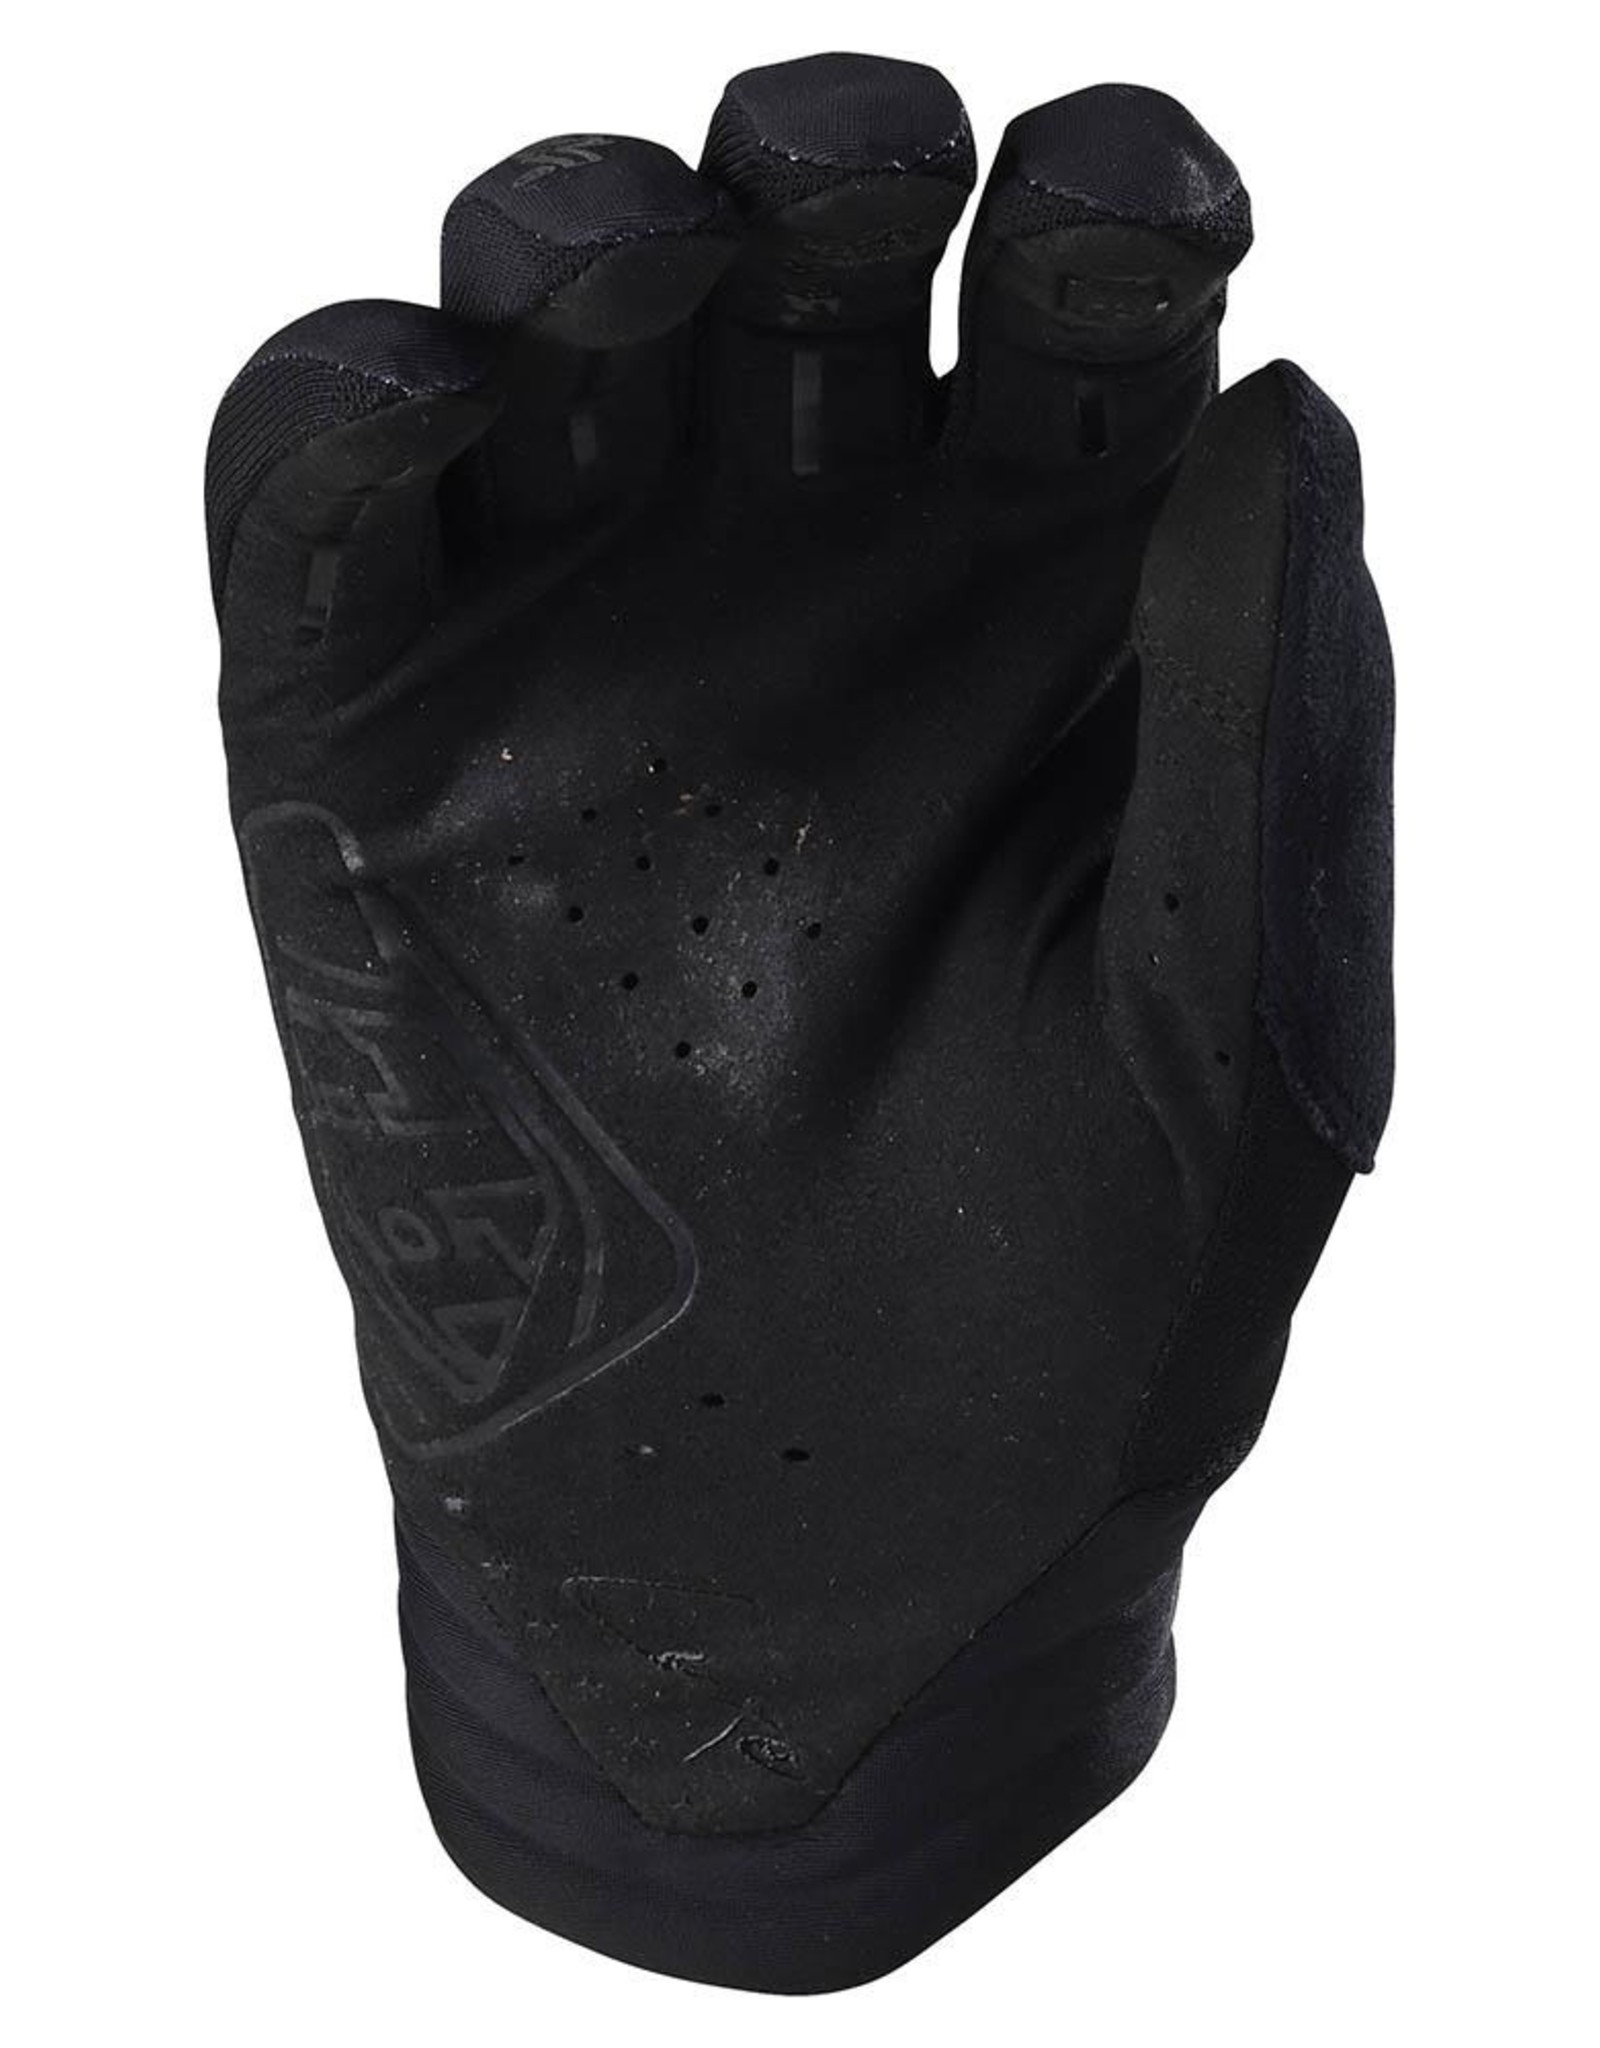 Troy Lee Designs TLD WMN'S Luxe Glove